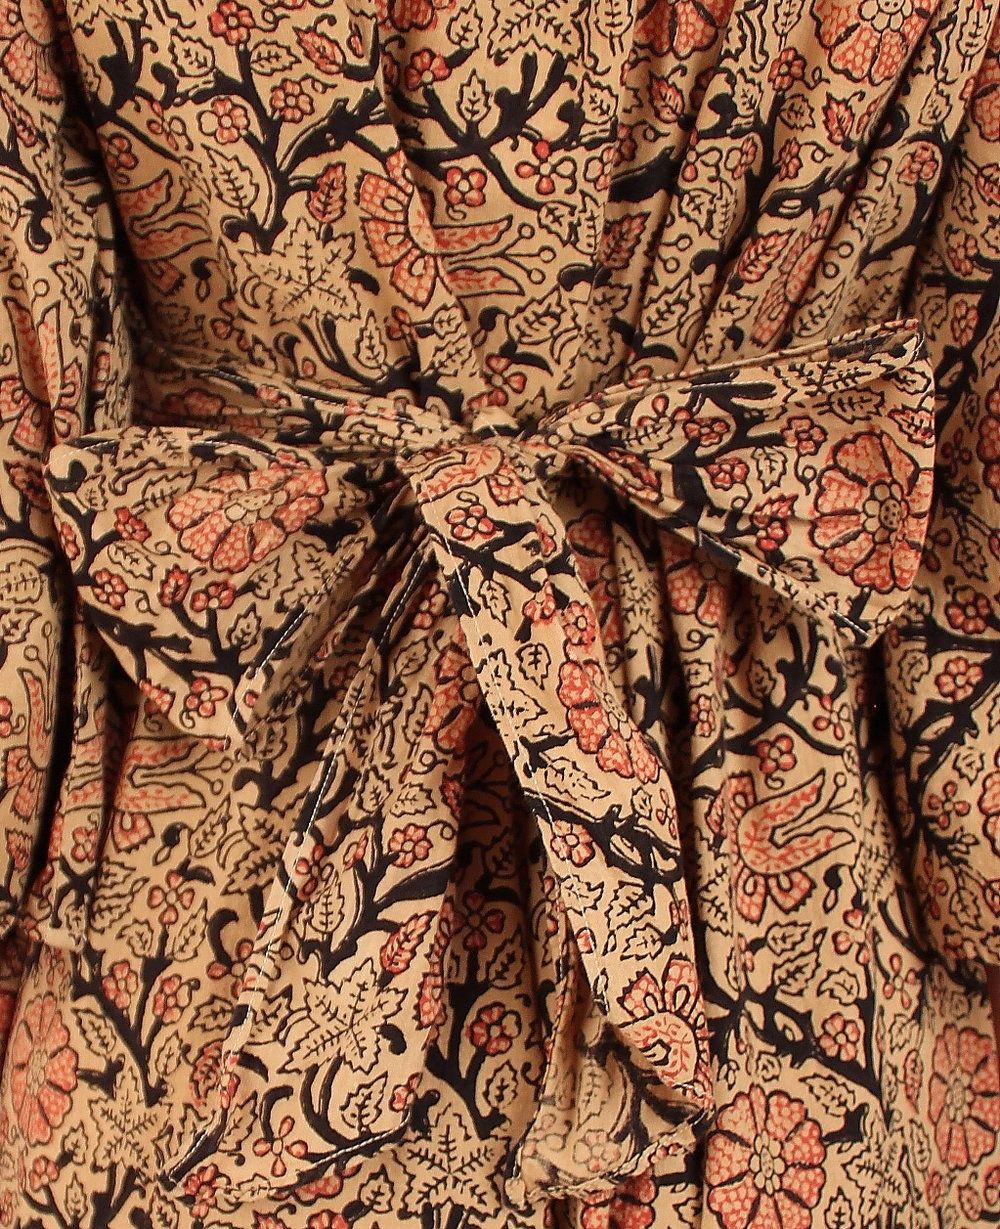 ab291e0bd ViNtAgE Indian Cotton Maxi Dress    Hand Block Printed    Woodstock Era —  Hellhound Vintage